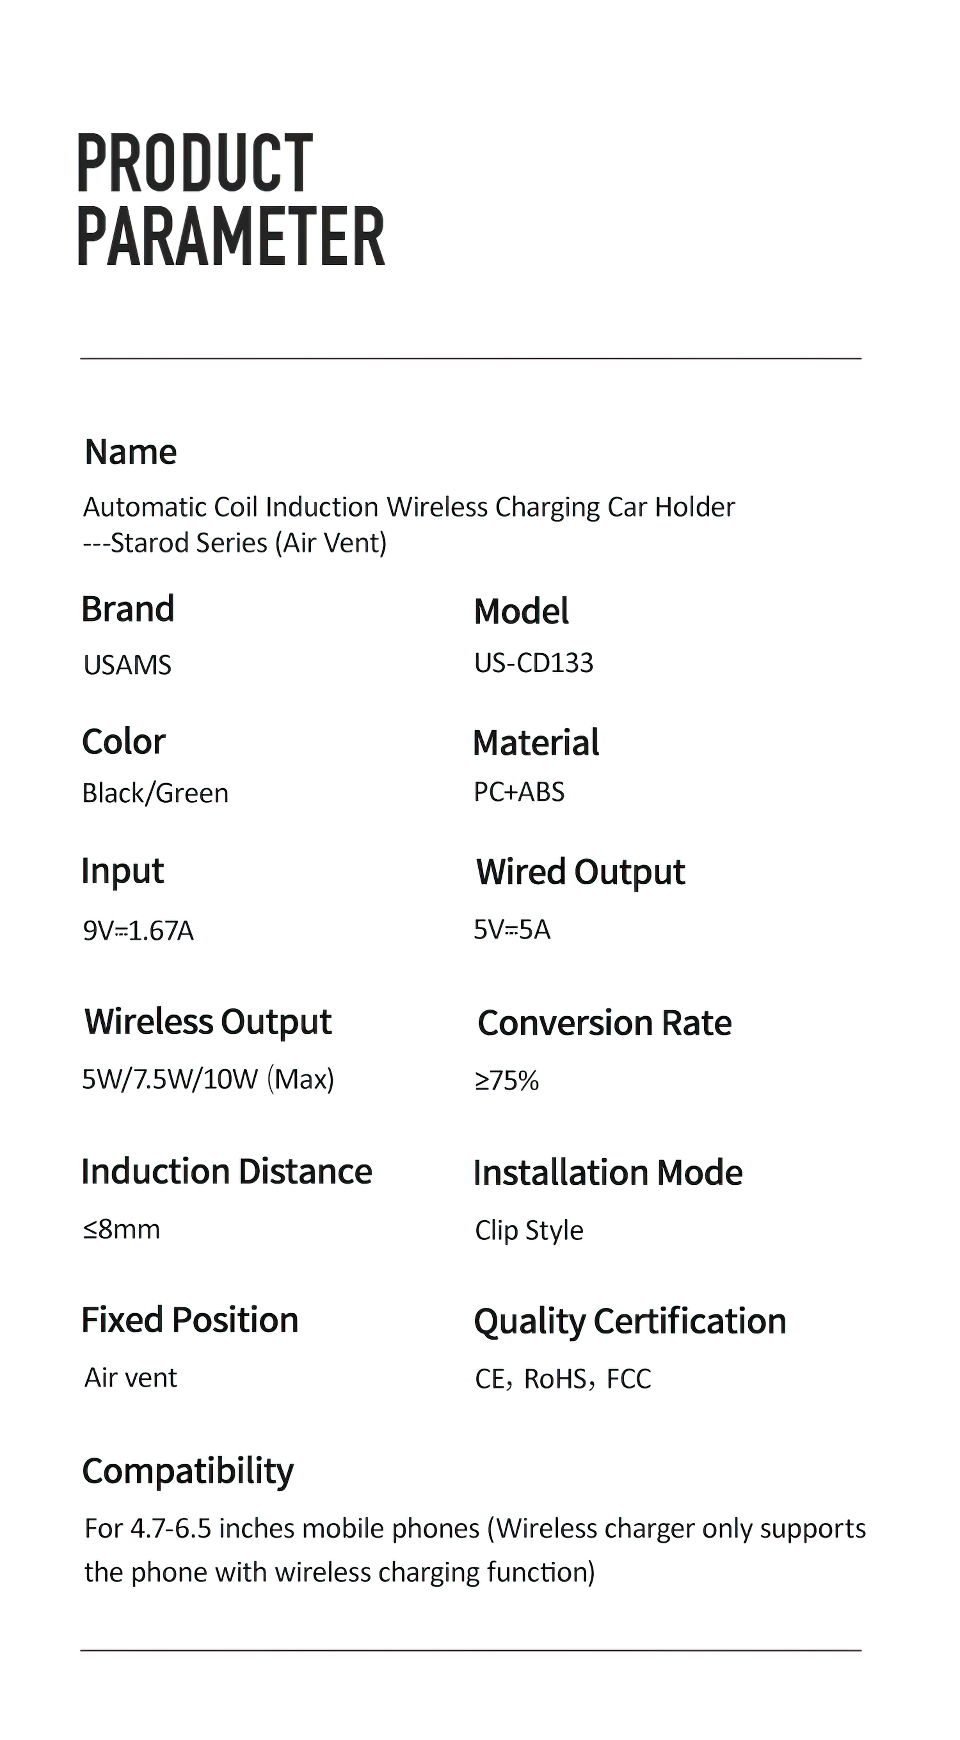 20200107-CD133 (19)-width-960px